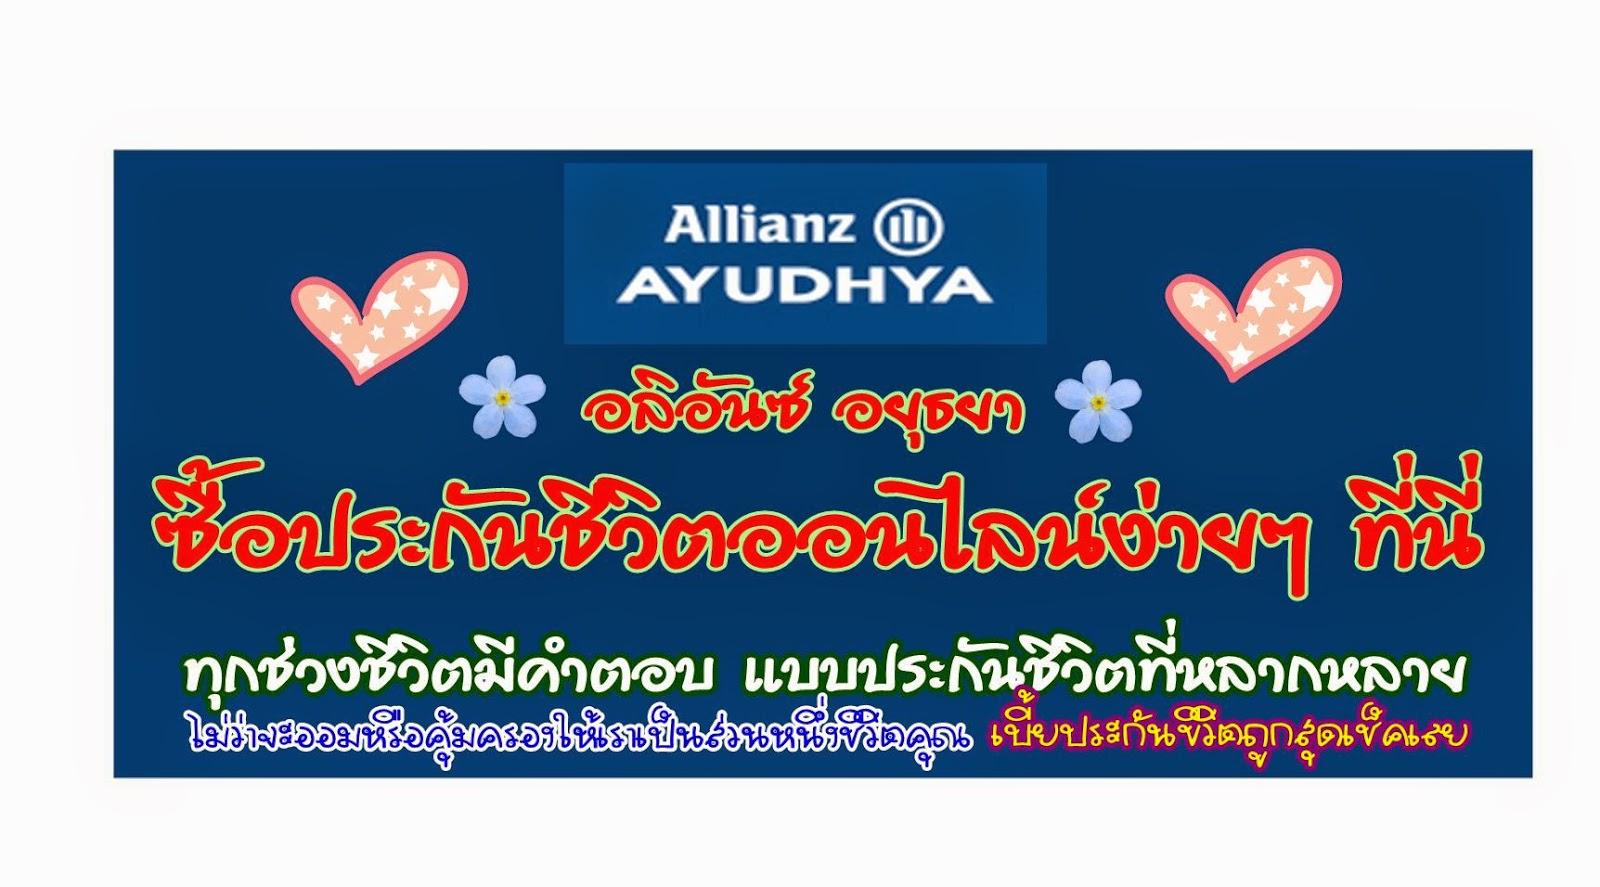 http://www.azaythai.com/064